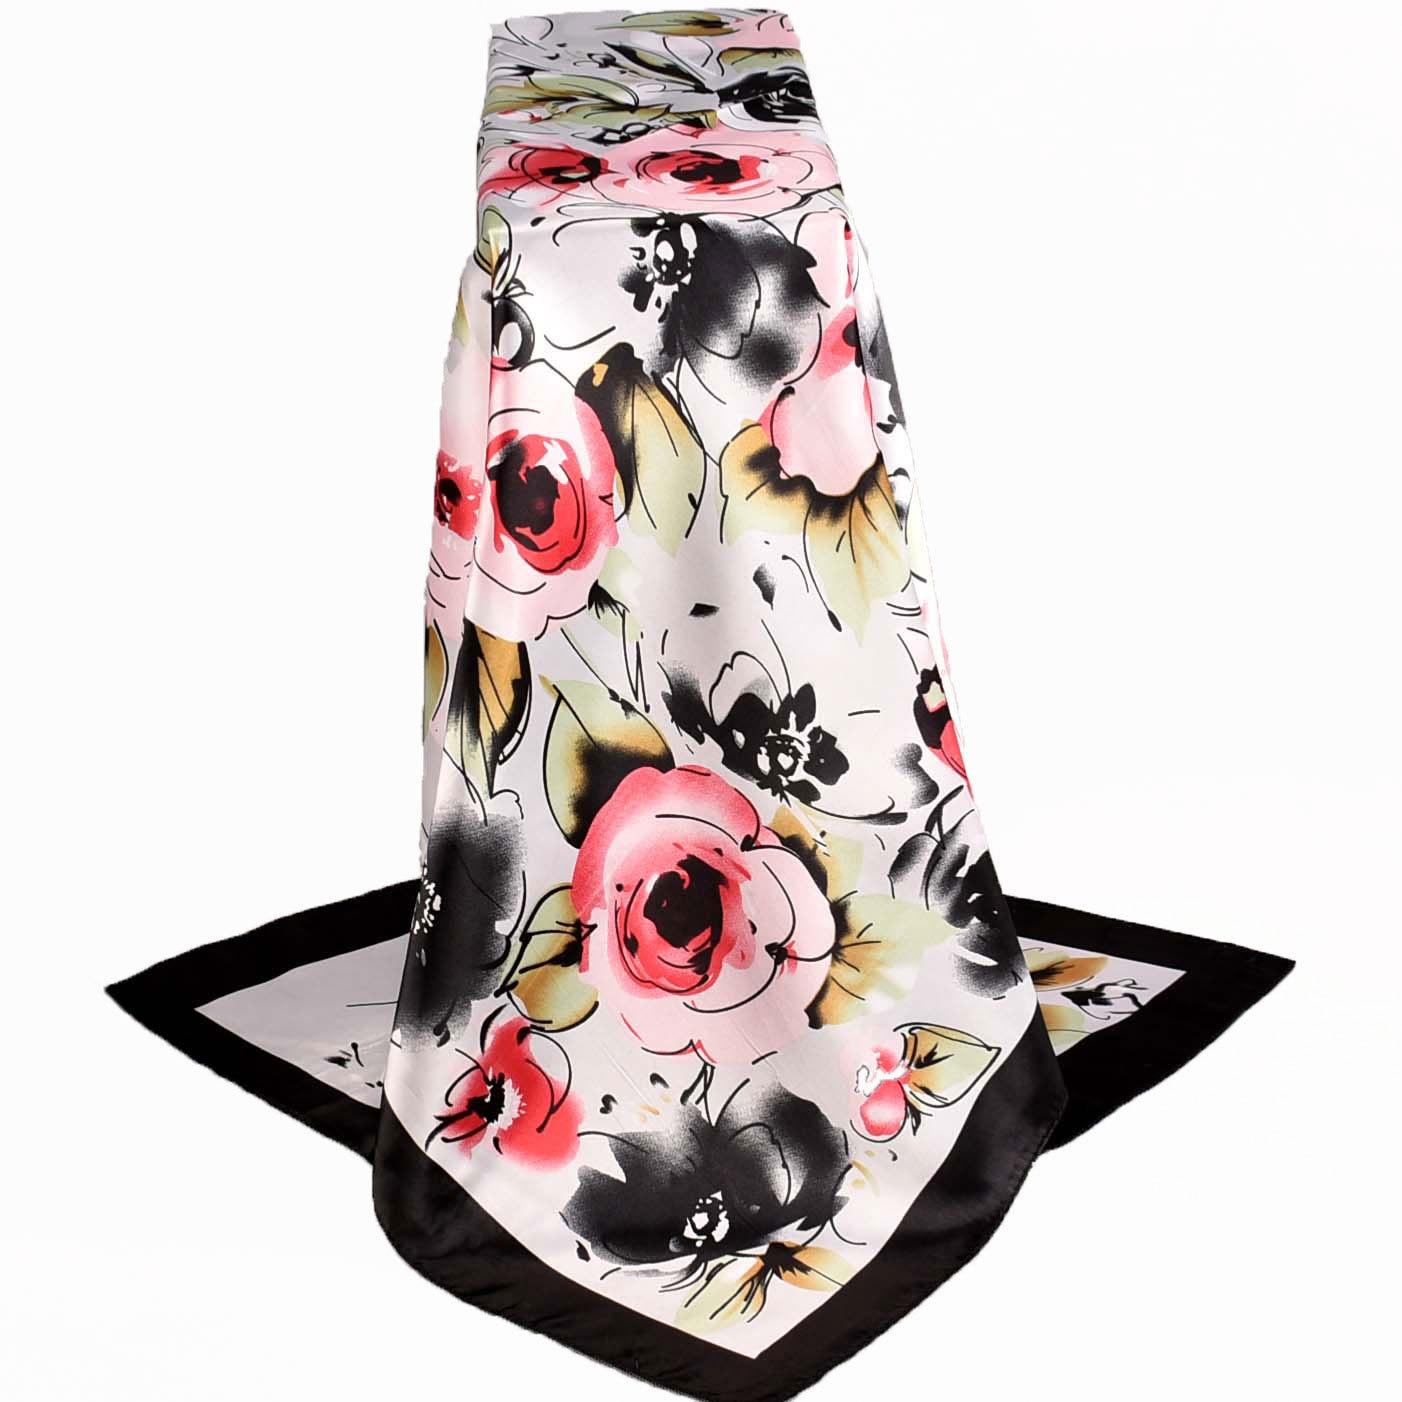 Lenco Women Rose Silk Scarf Printed,90*90cm Multicolor Satin Scarf Shawl For Ladies,Fashion Handkerchief Spring Silk Scarves